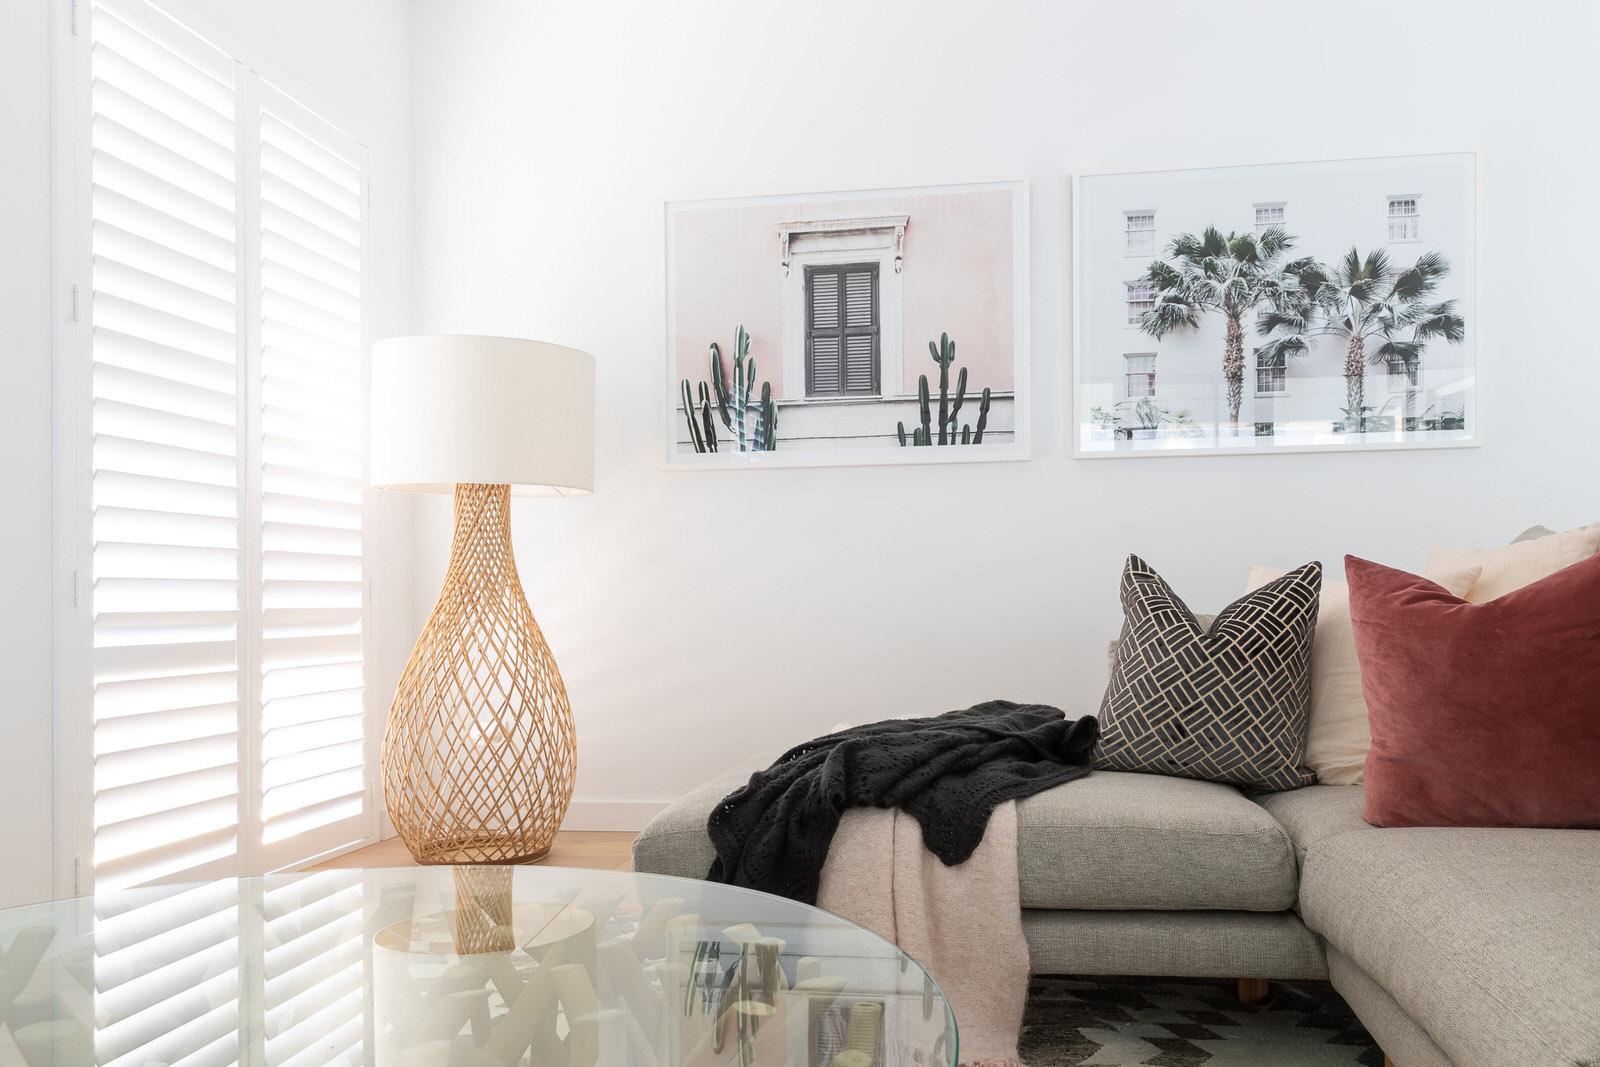 Ammon_Creative-Interior_Photography-Real_Estate-Hatch_Interiors-0112.jpg